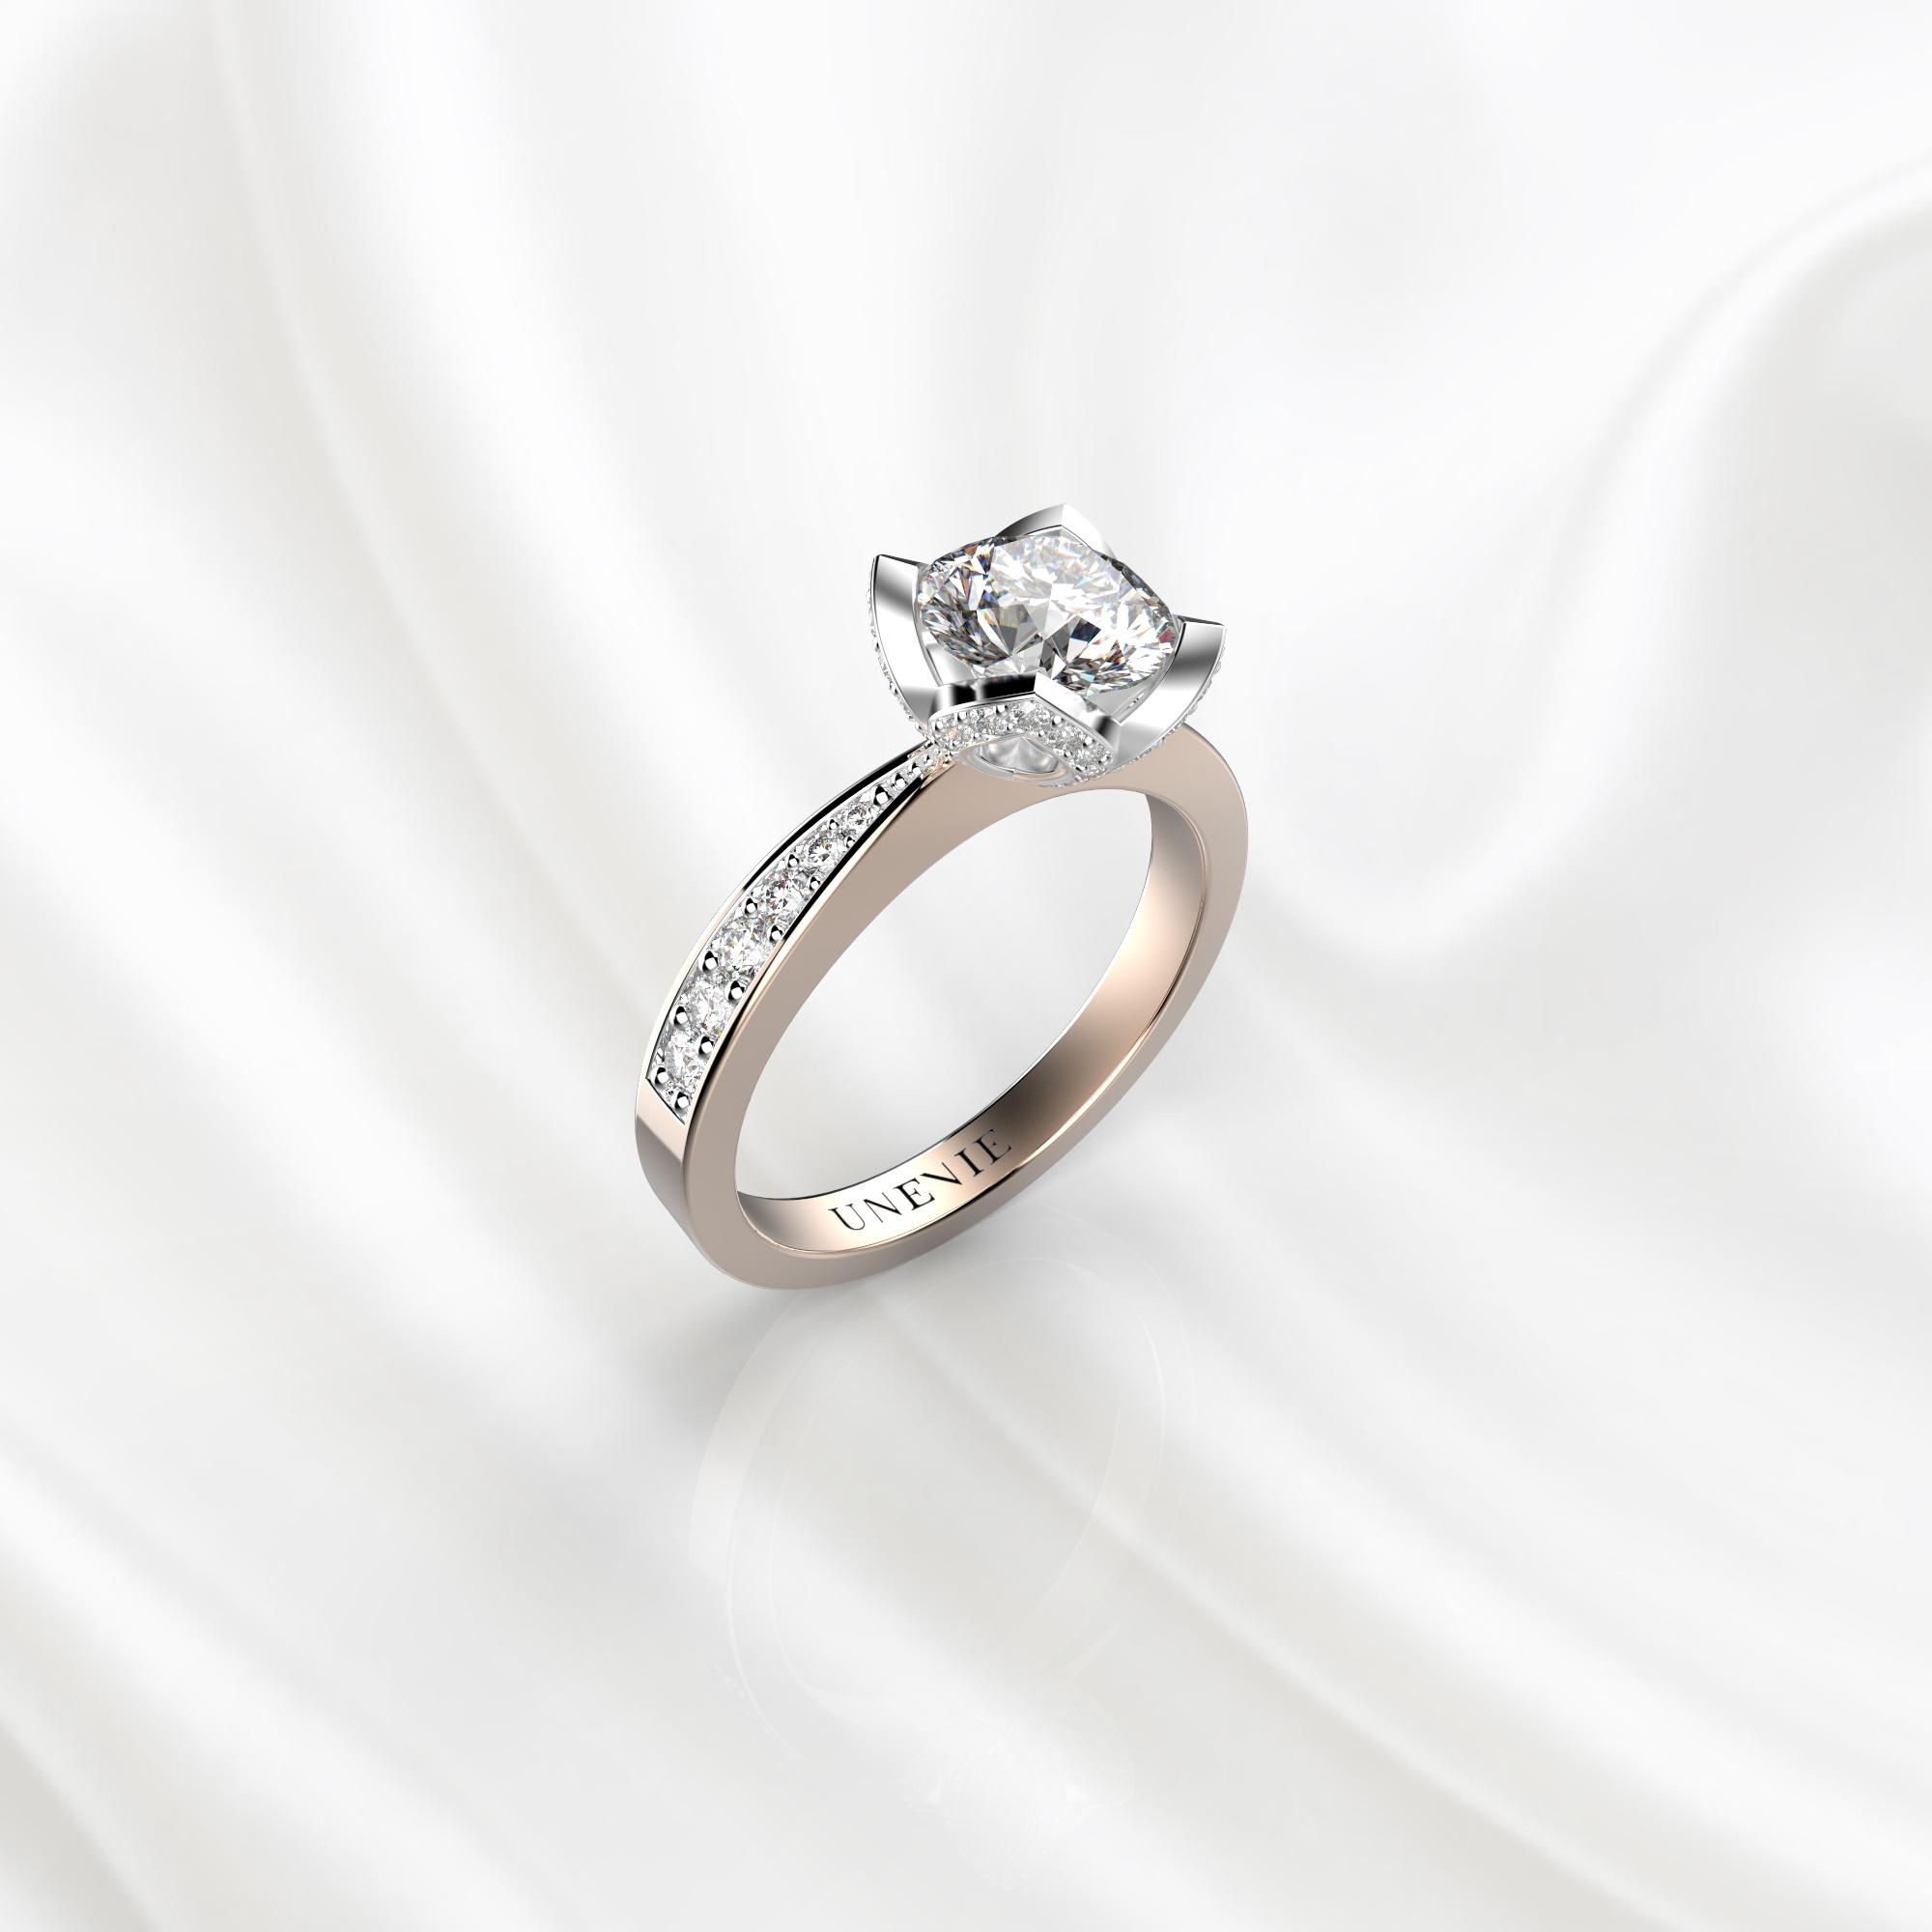 N21 Помолвочное кольцо из розово-белого золота с бриллиантом 0.3 карат